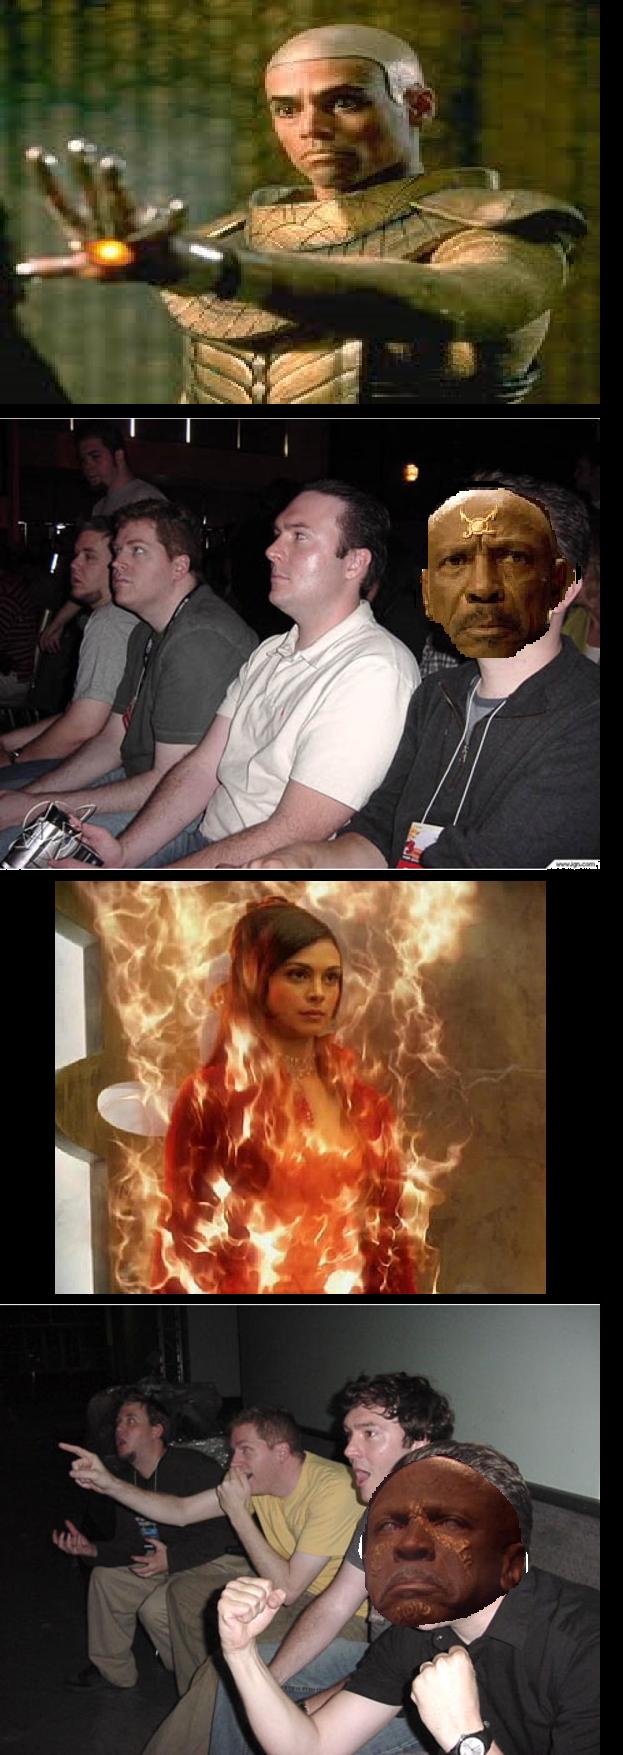 Hallowed are the Ori (March Meme Revival)